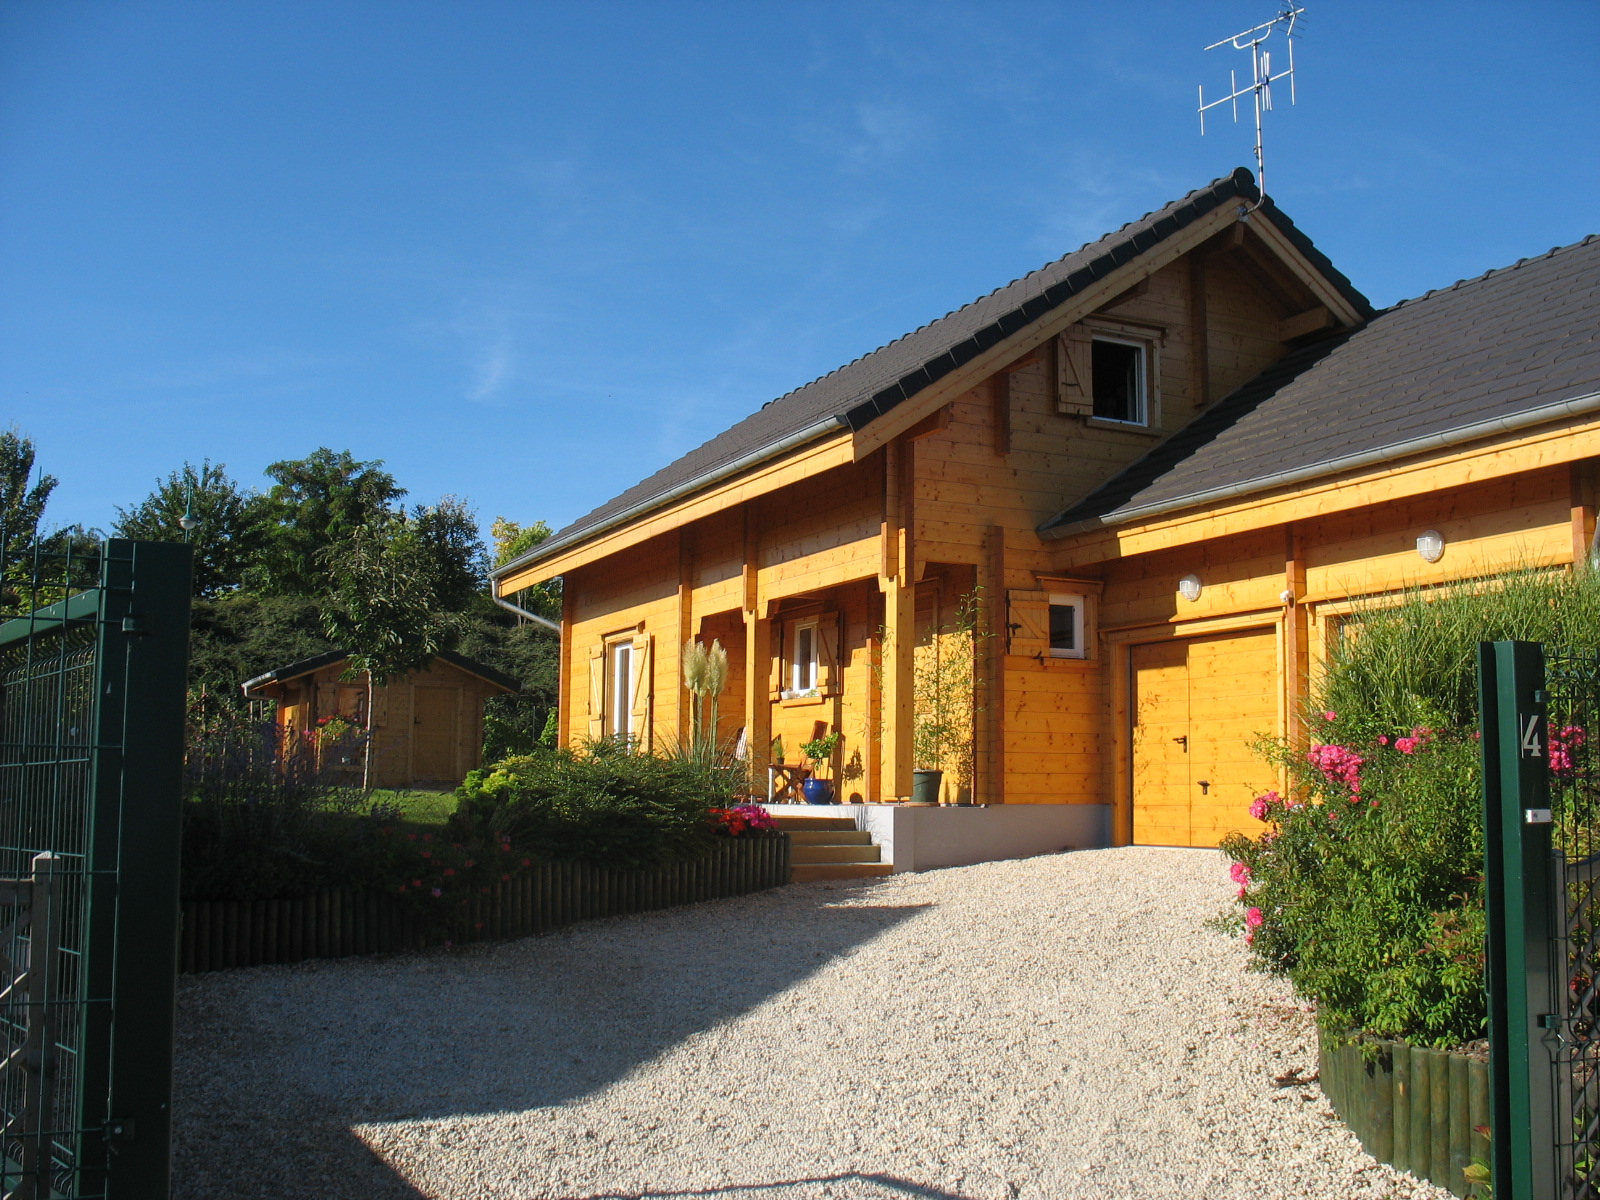 Constructeur Maison Bois Massif Gironde u2013 Maison Moderne # Constructeur Maison Bois Gironde